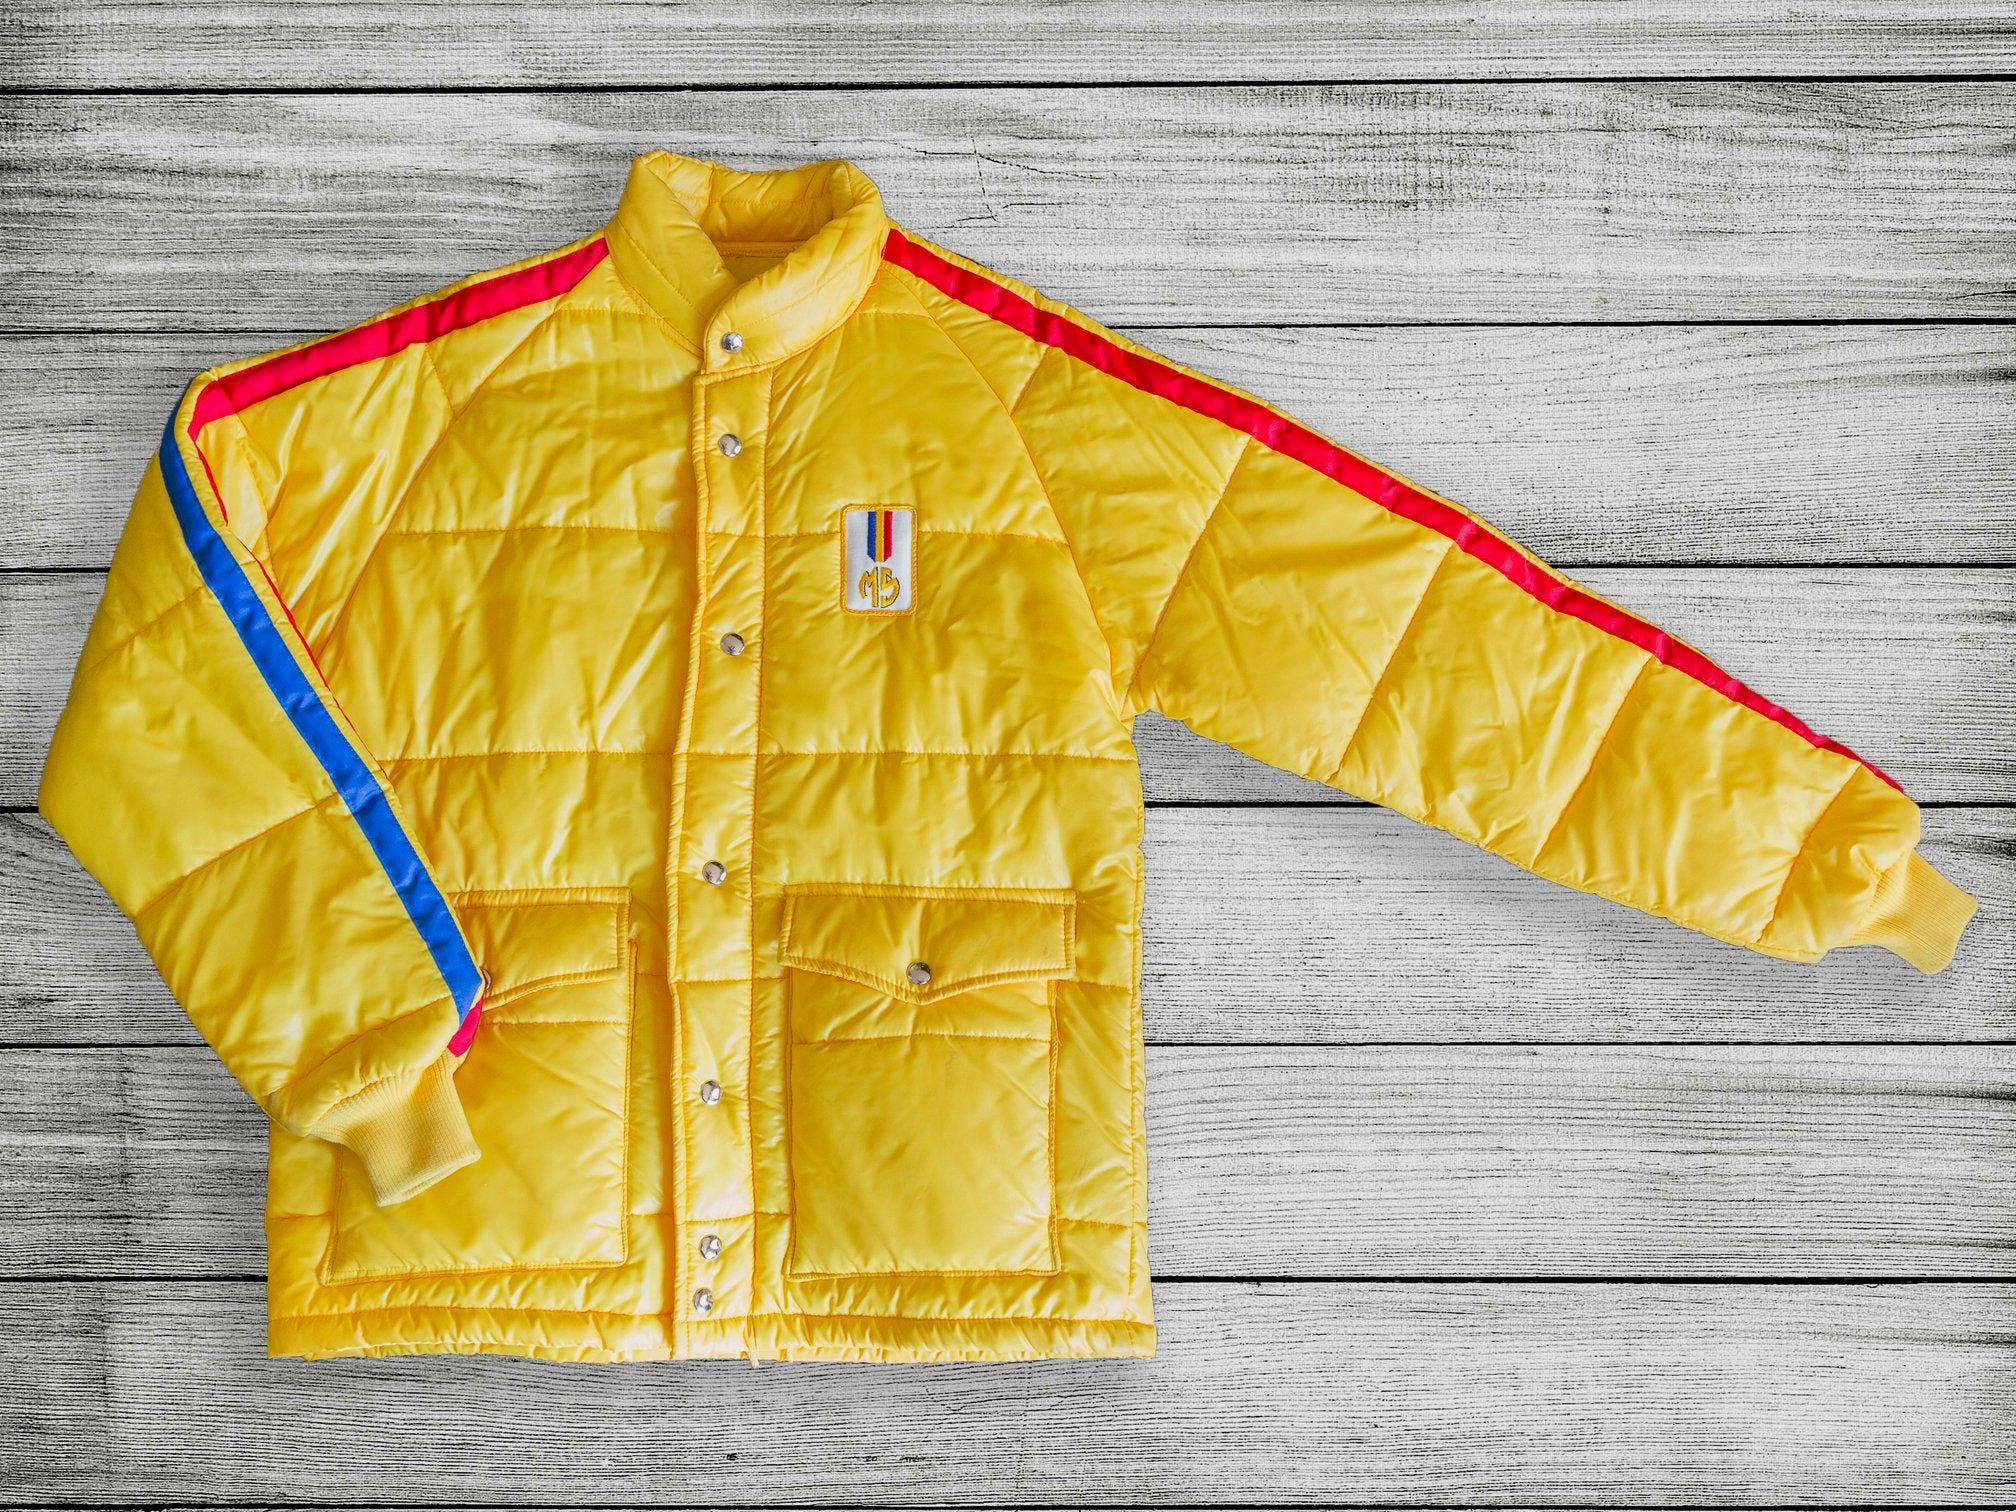 Vintage 80s Yellow Malcolm Smith Racking Jacket Vintage Etsy Yellow Puffer Jacket Vintage Jacket Jackets